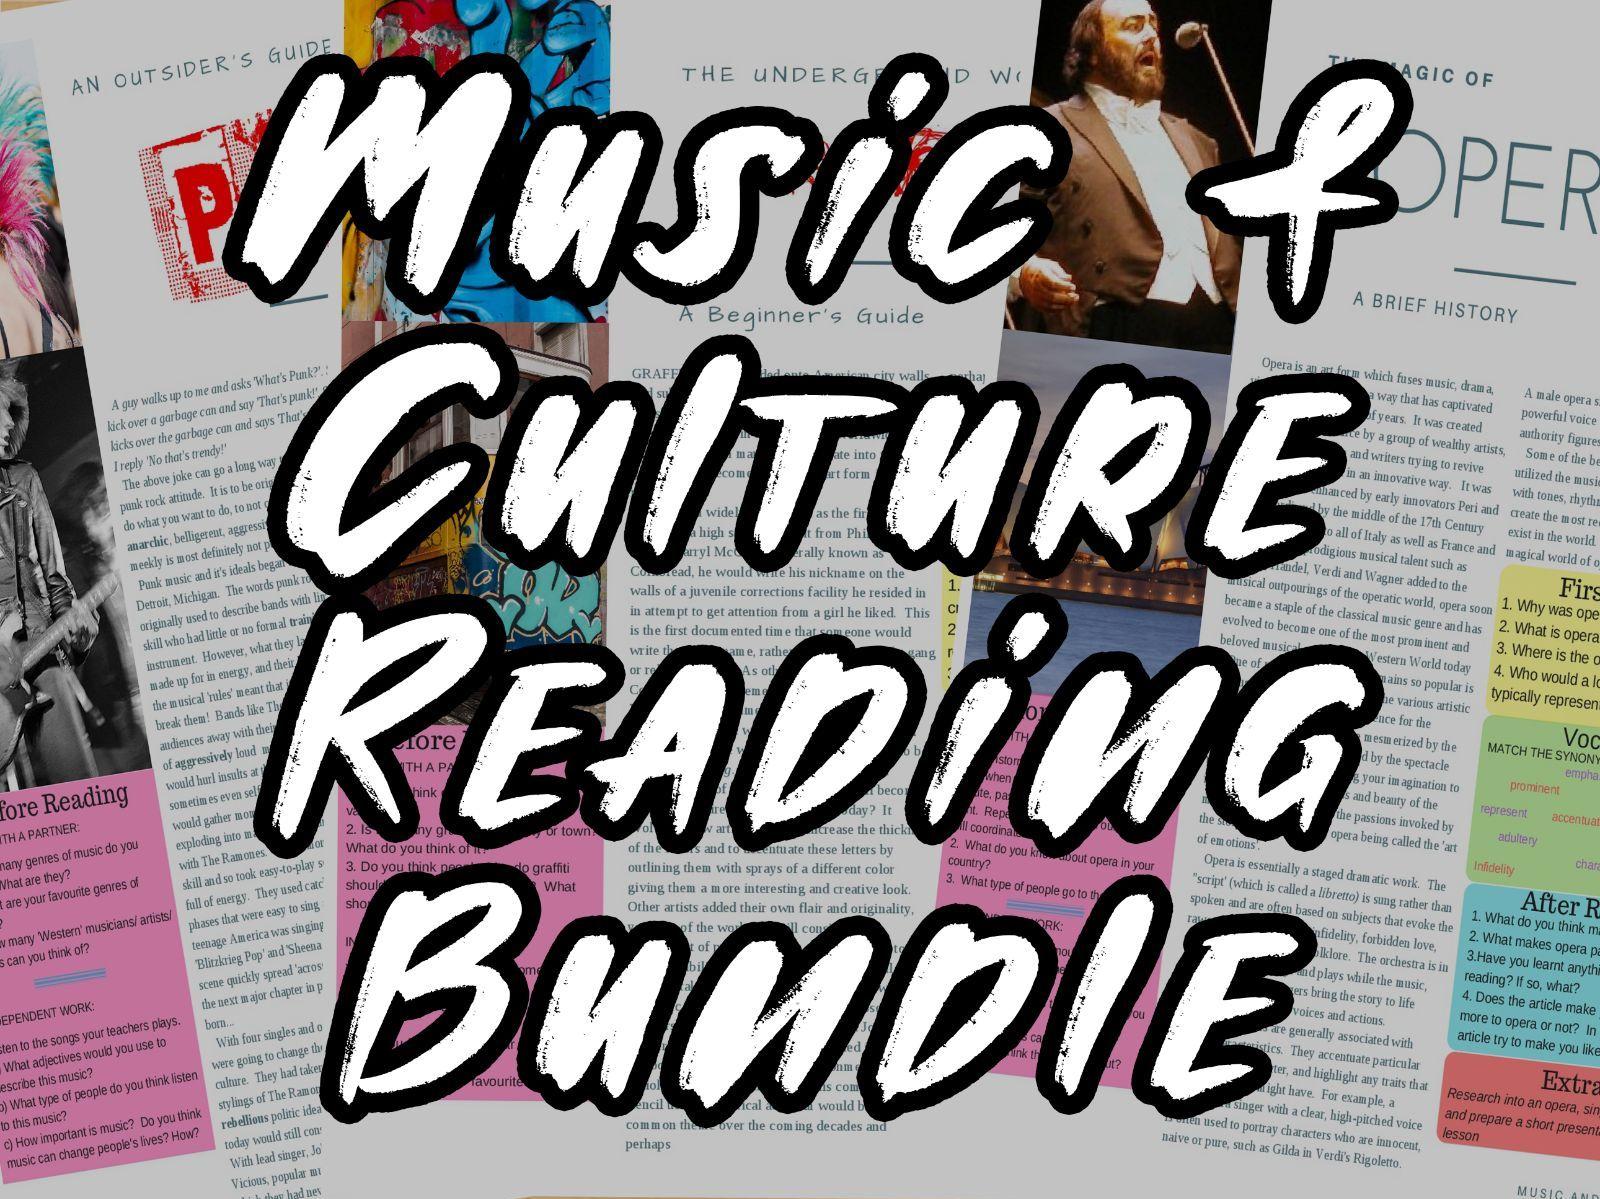 Music and Culture - ESL & English Readings on Opera, Graffiti & Punk w/ FULL Lesson plans